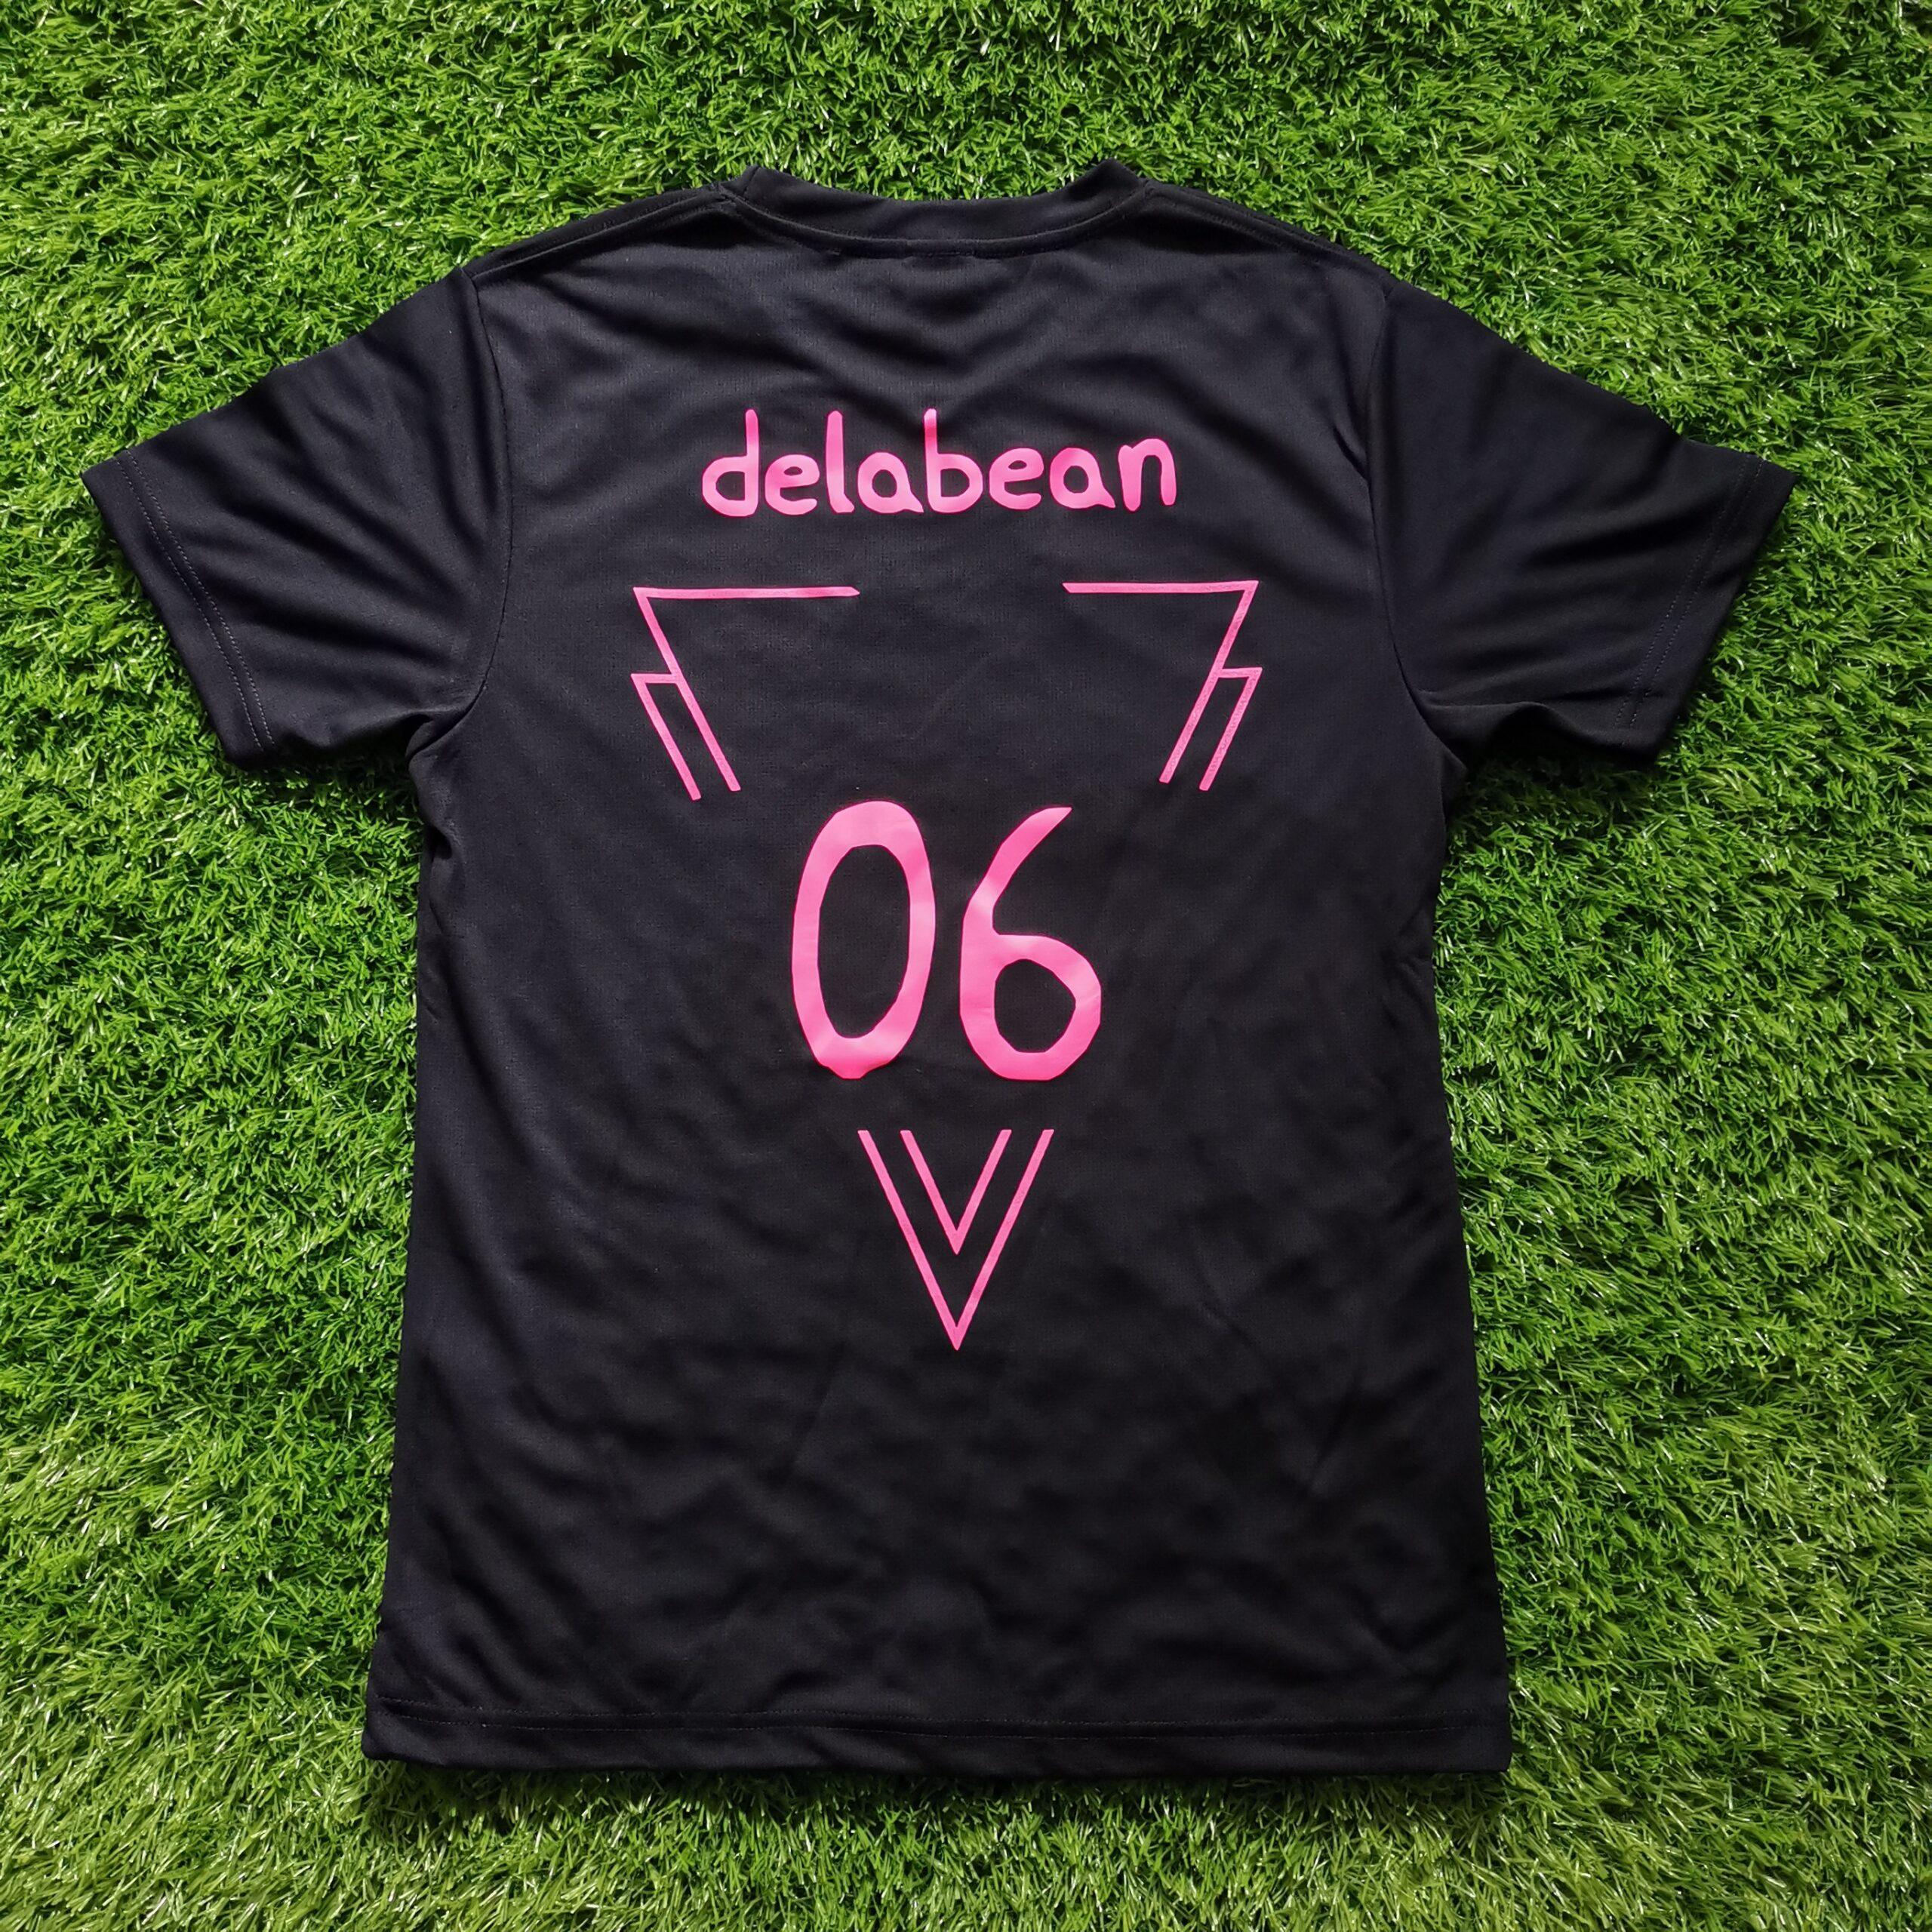 Neon Pink Silkscreen Printing on Black T-Shirt